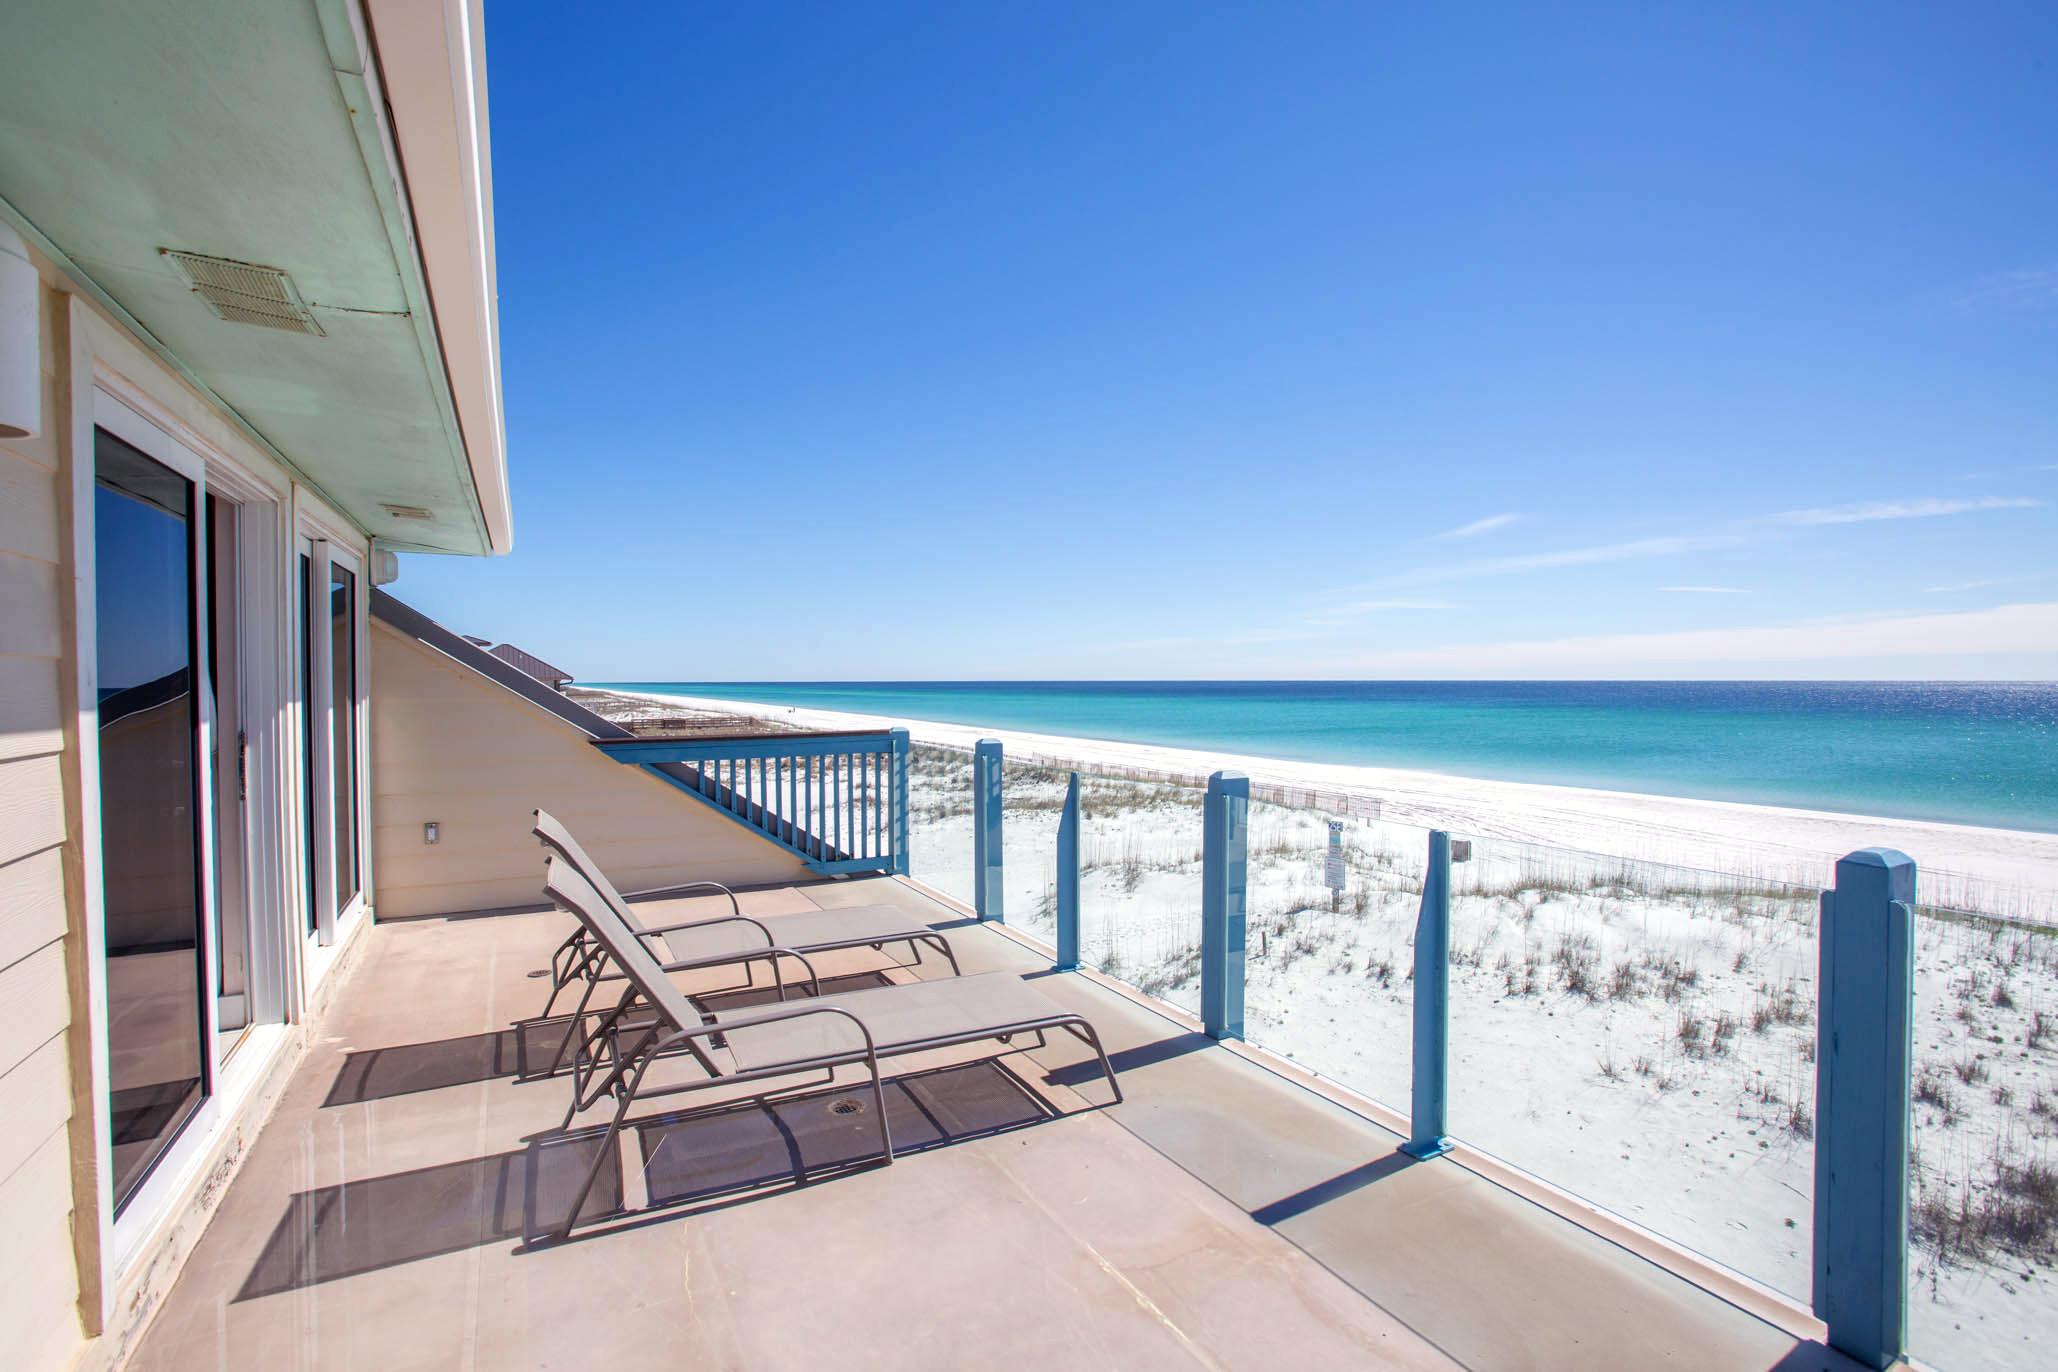 Ariola 1214 House/Cottage rental in Luxury Homes in Pensacola Beach Florida - #32